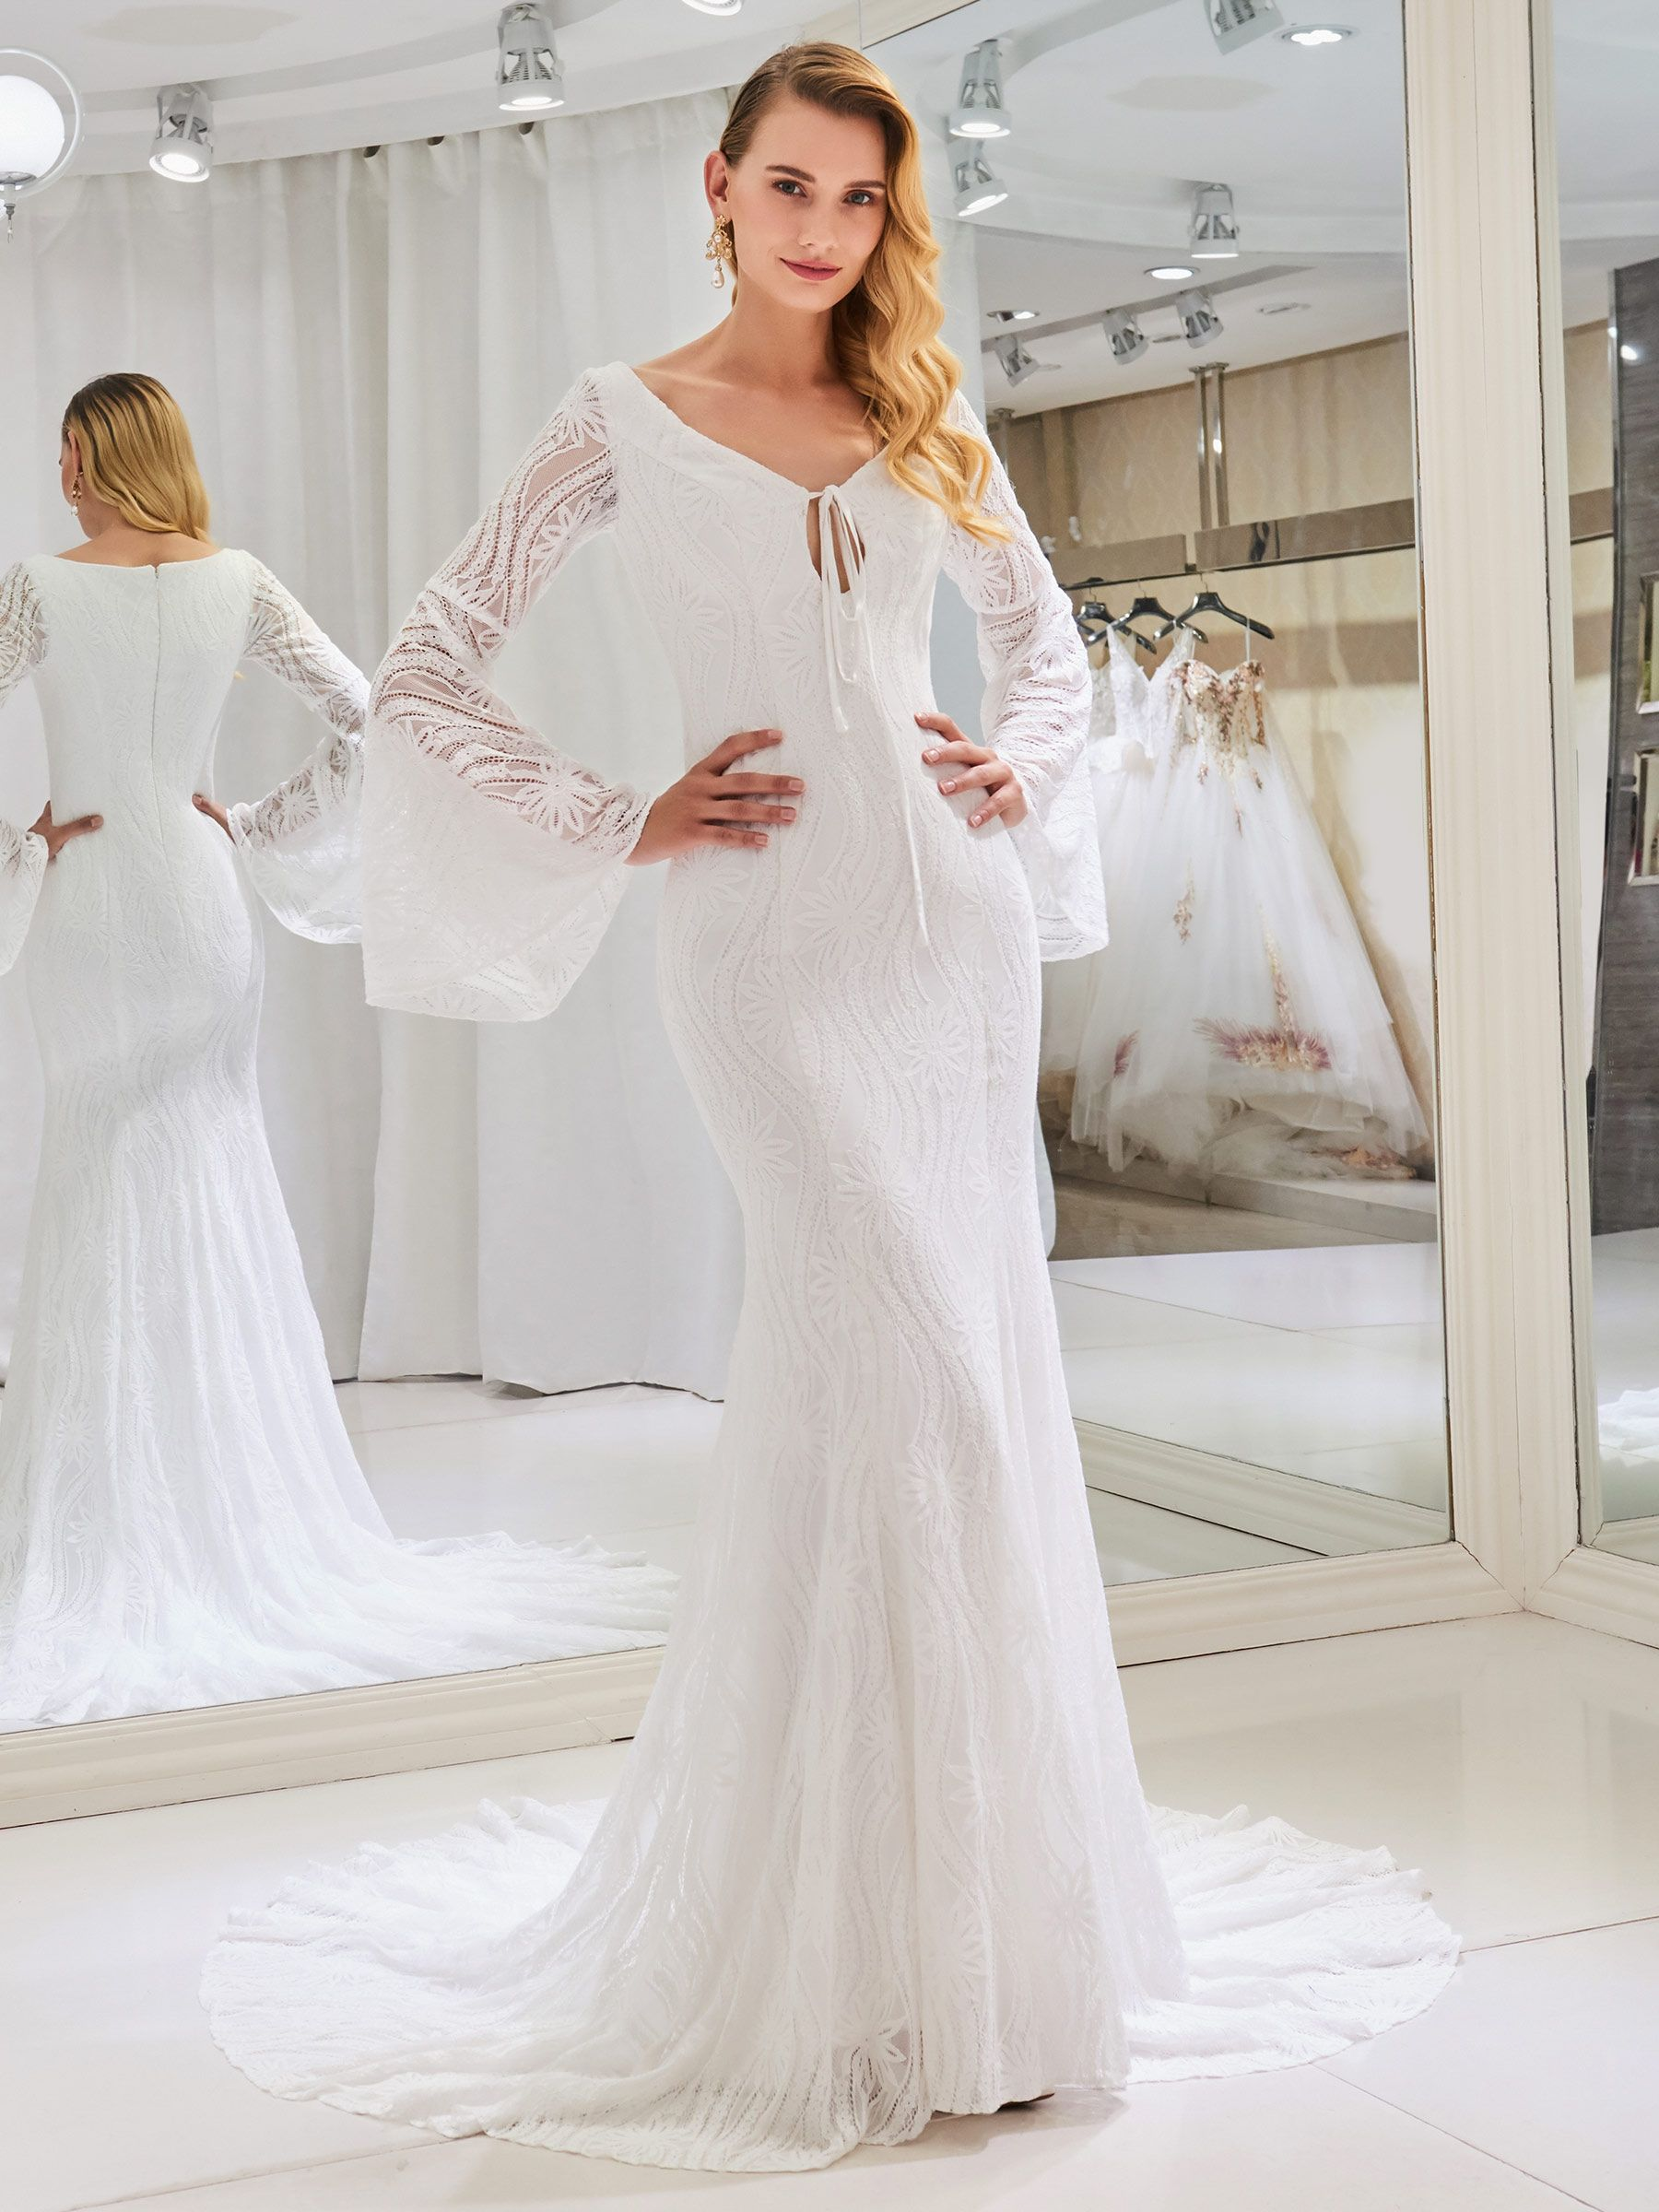 Mermaid lace wedding dress  VNeck Mermaid Lace Wedding Dress with Long Sleeve  Evlilik zamanı